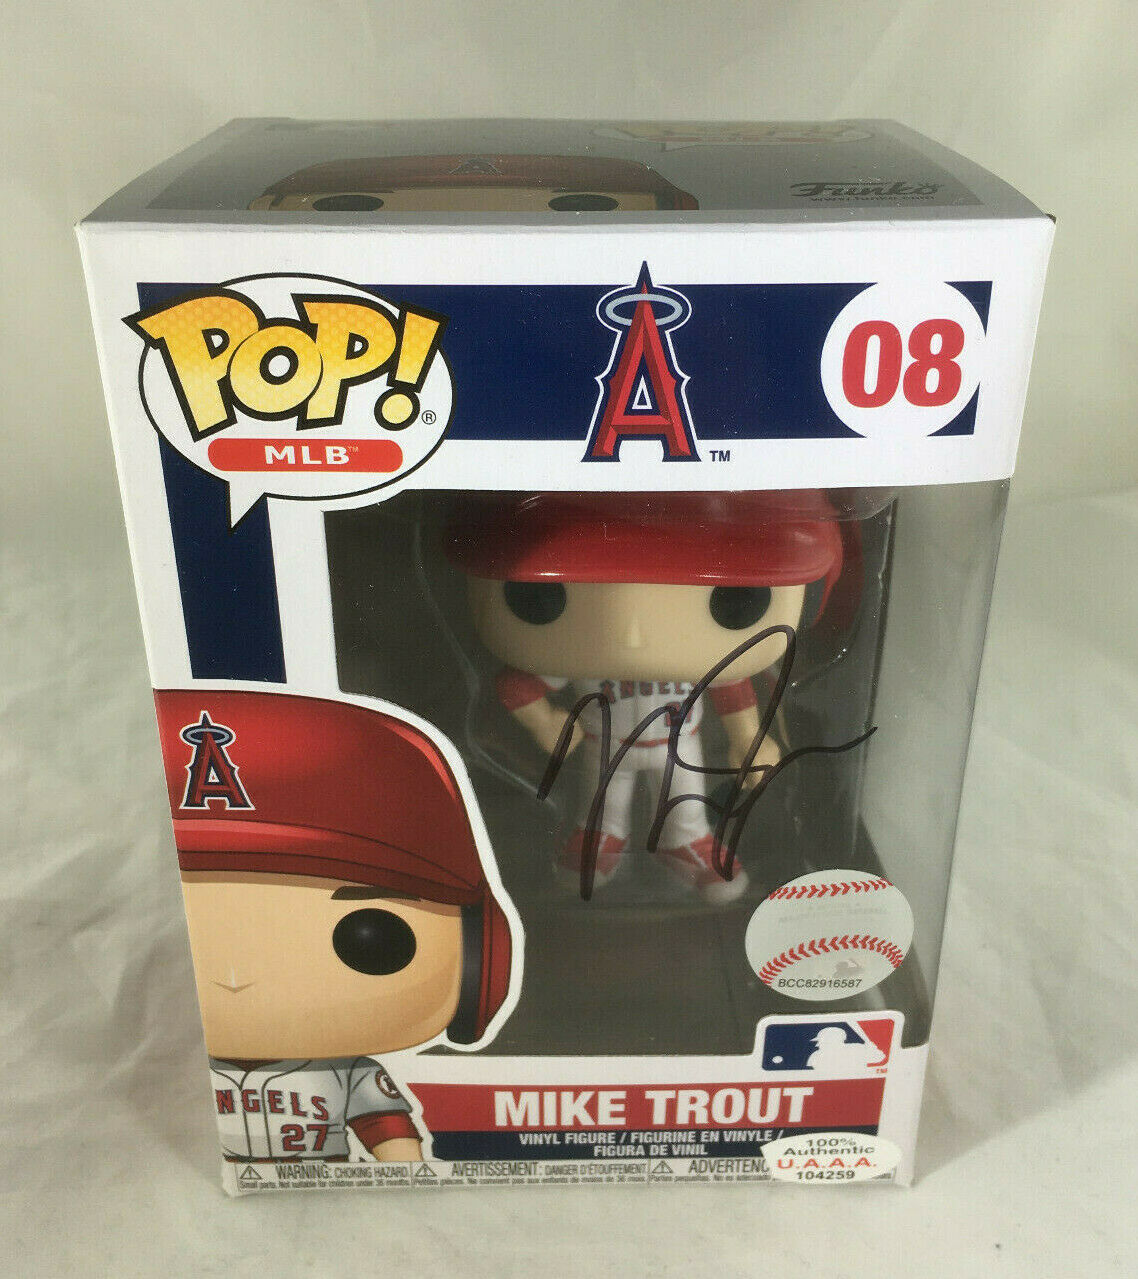 MIKE TROUT / AUTOGRAPHED L. A. ANGELS LOGO MLB FUNKO POP VINYL FIGURINE / COA